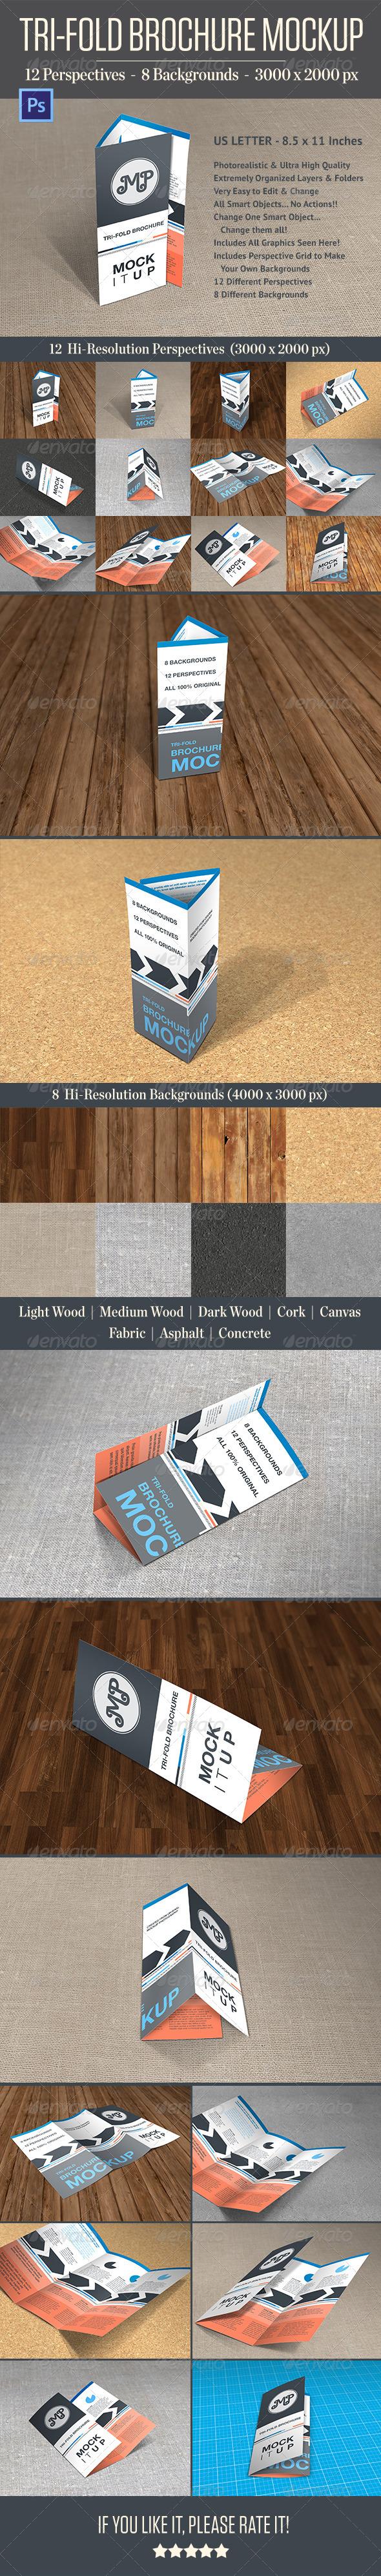 Photorealistic Trifold Brochure Mockup - Print Product Mock-Ups